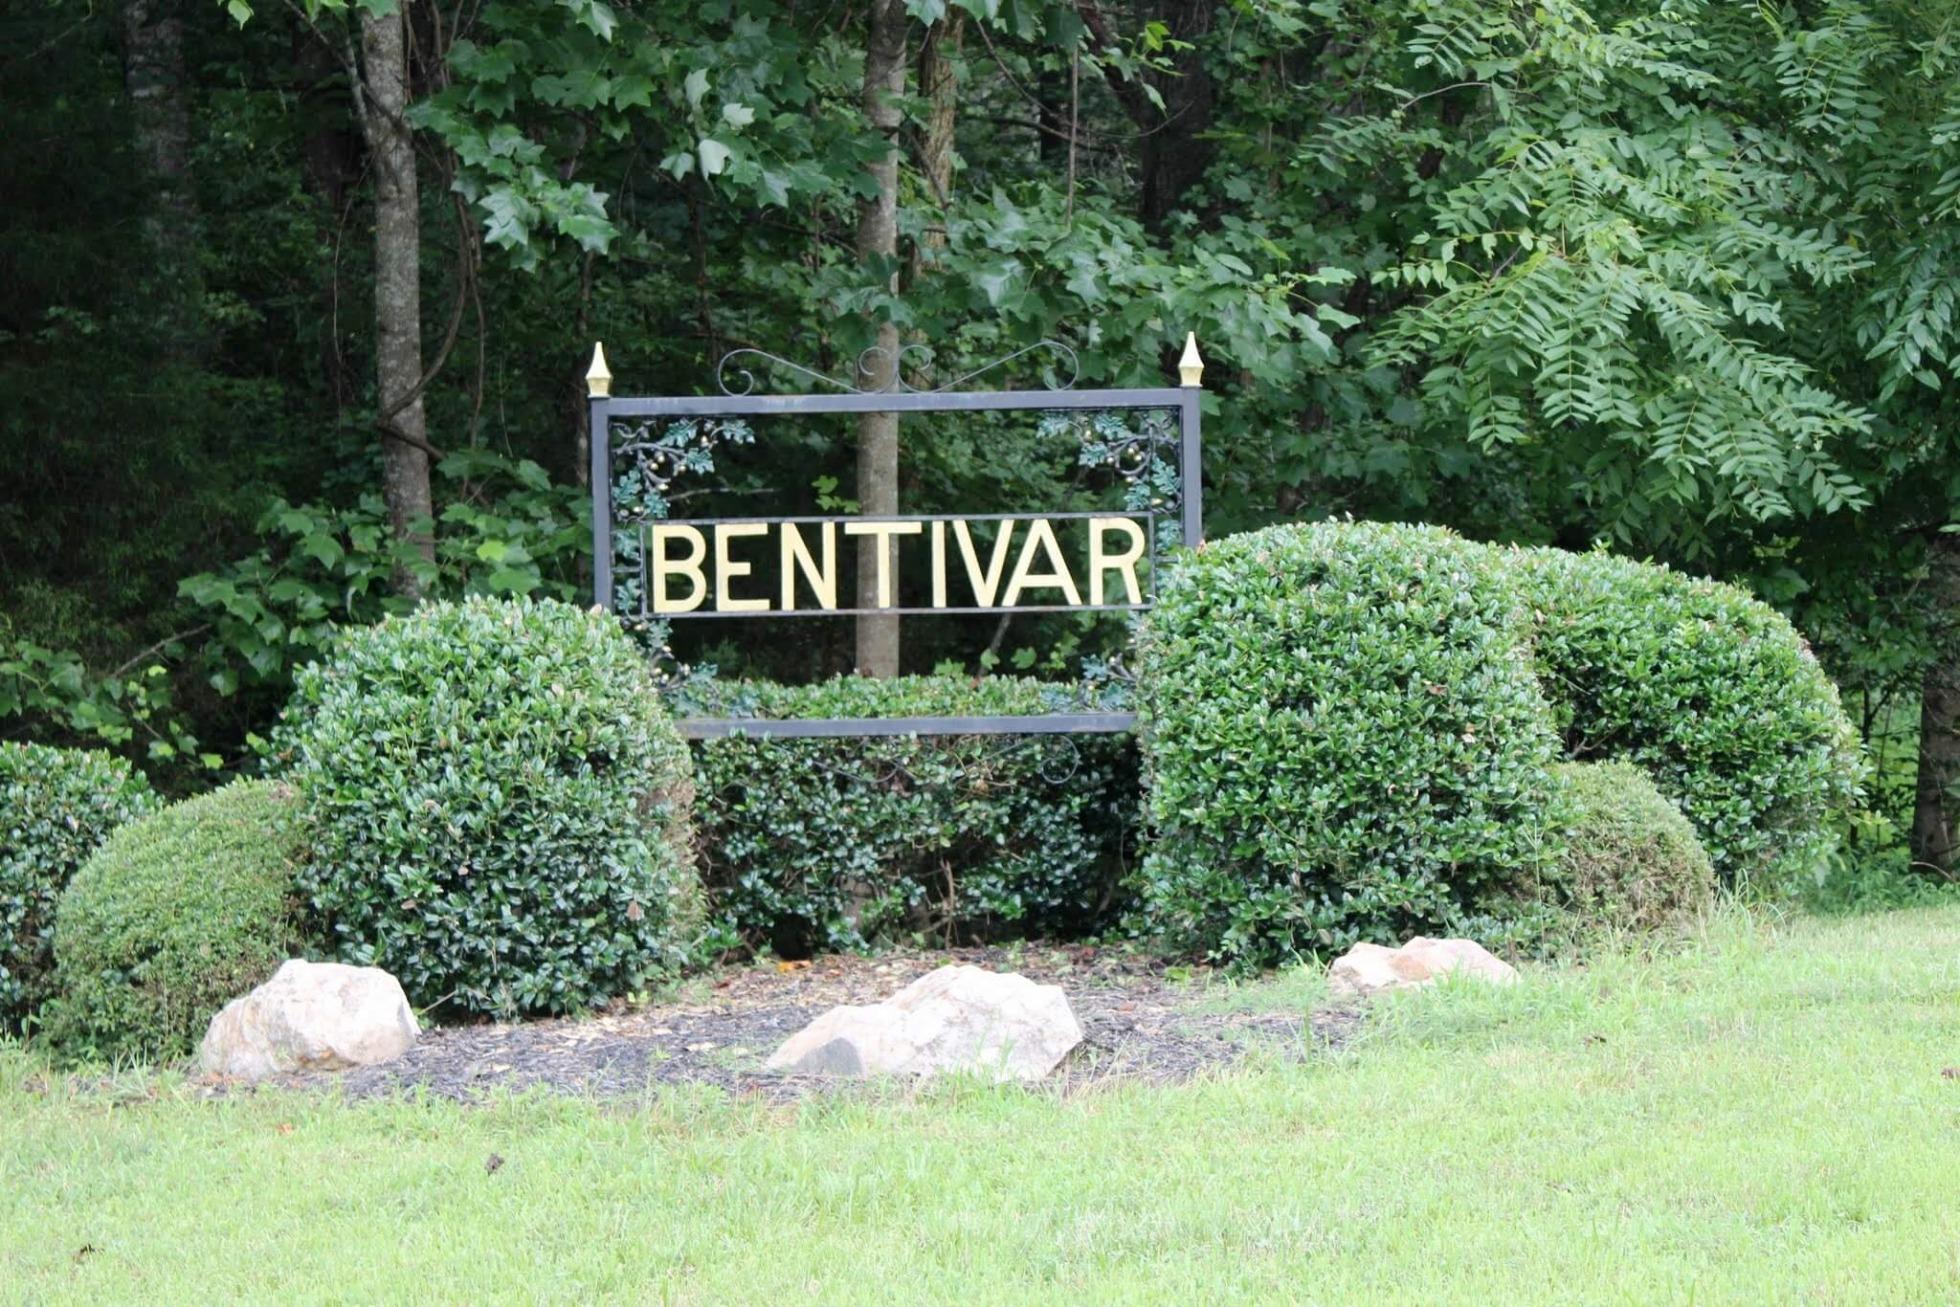 bentivar-1